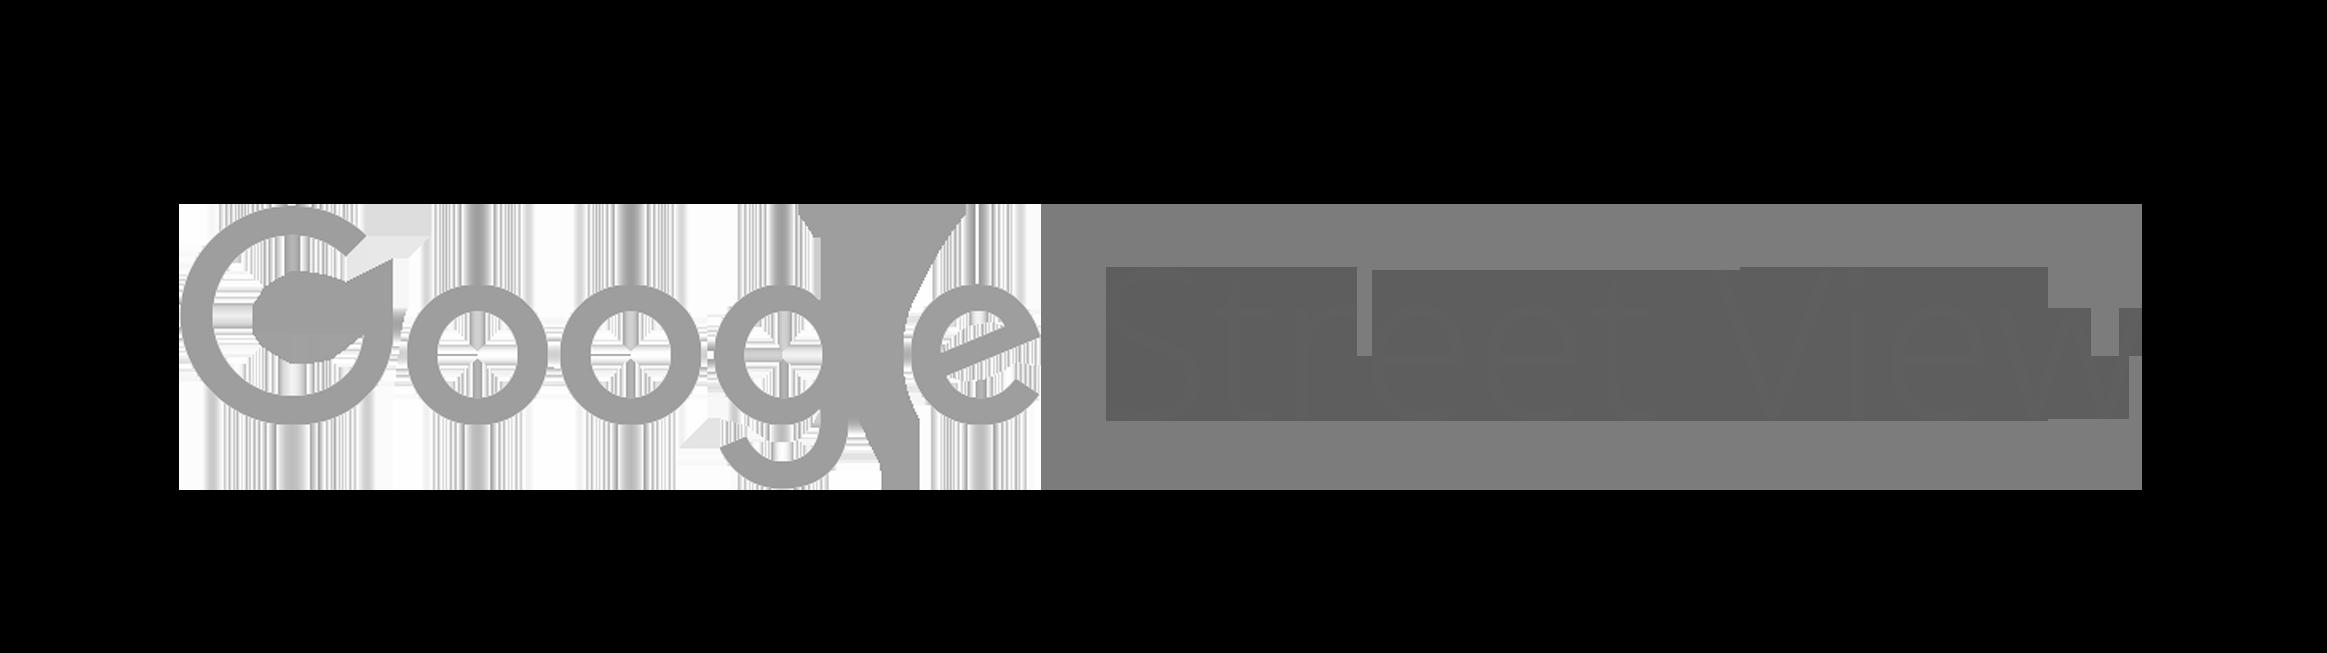 Google-Street-View-Logo.png